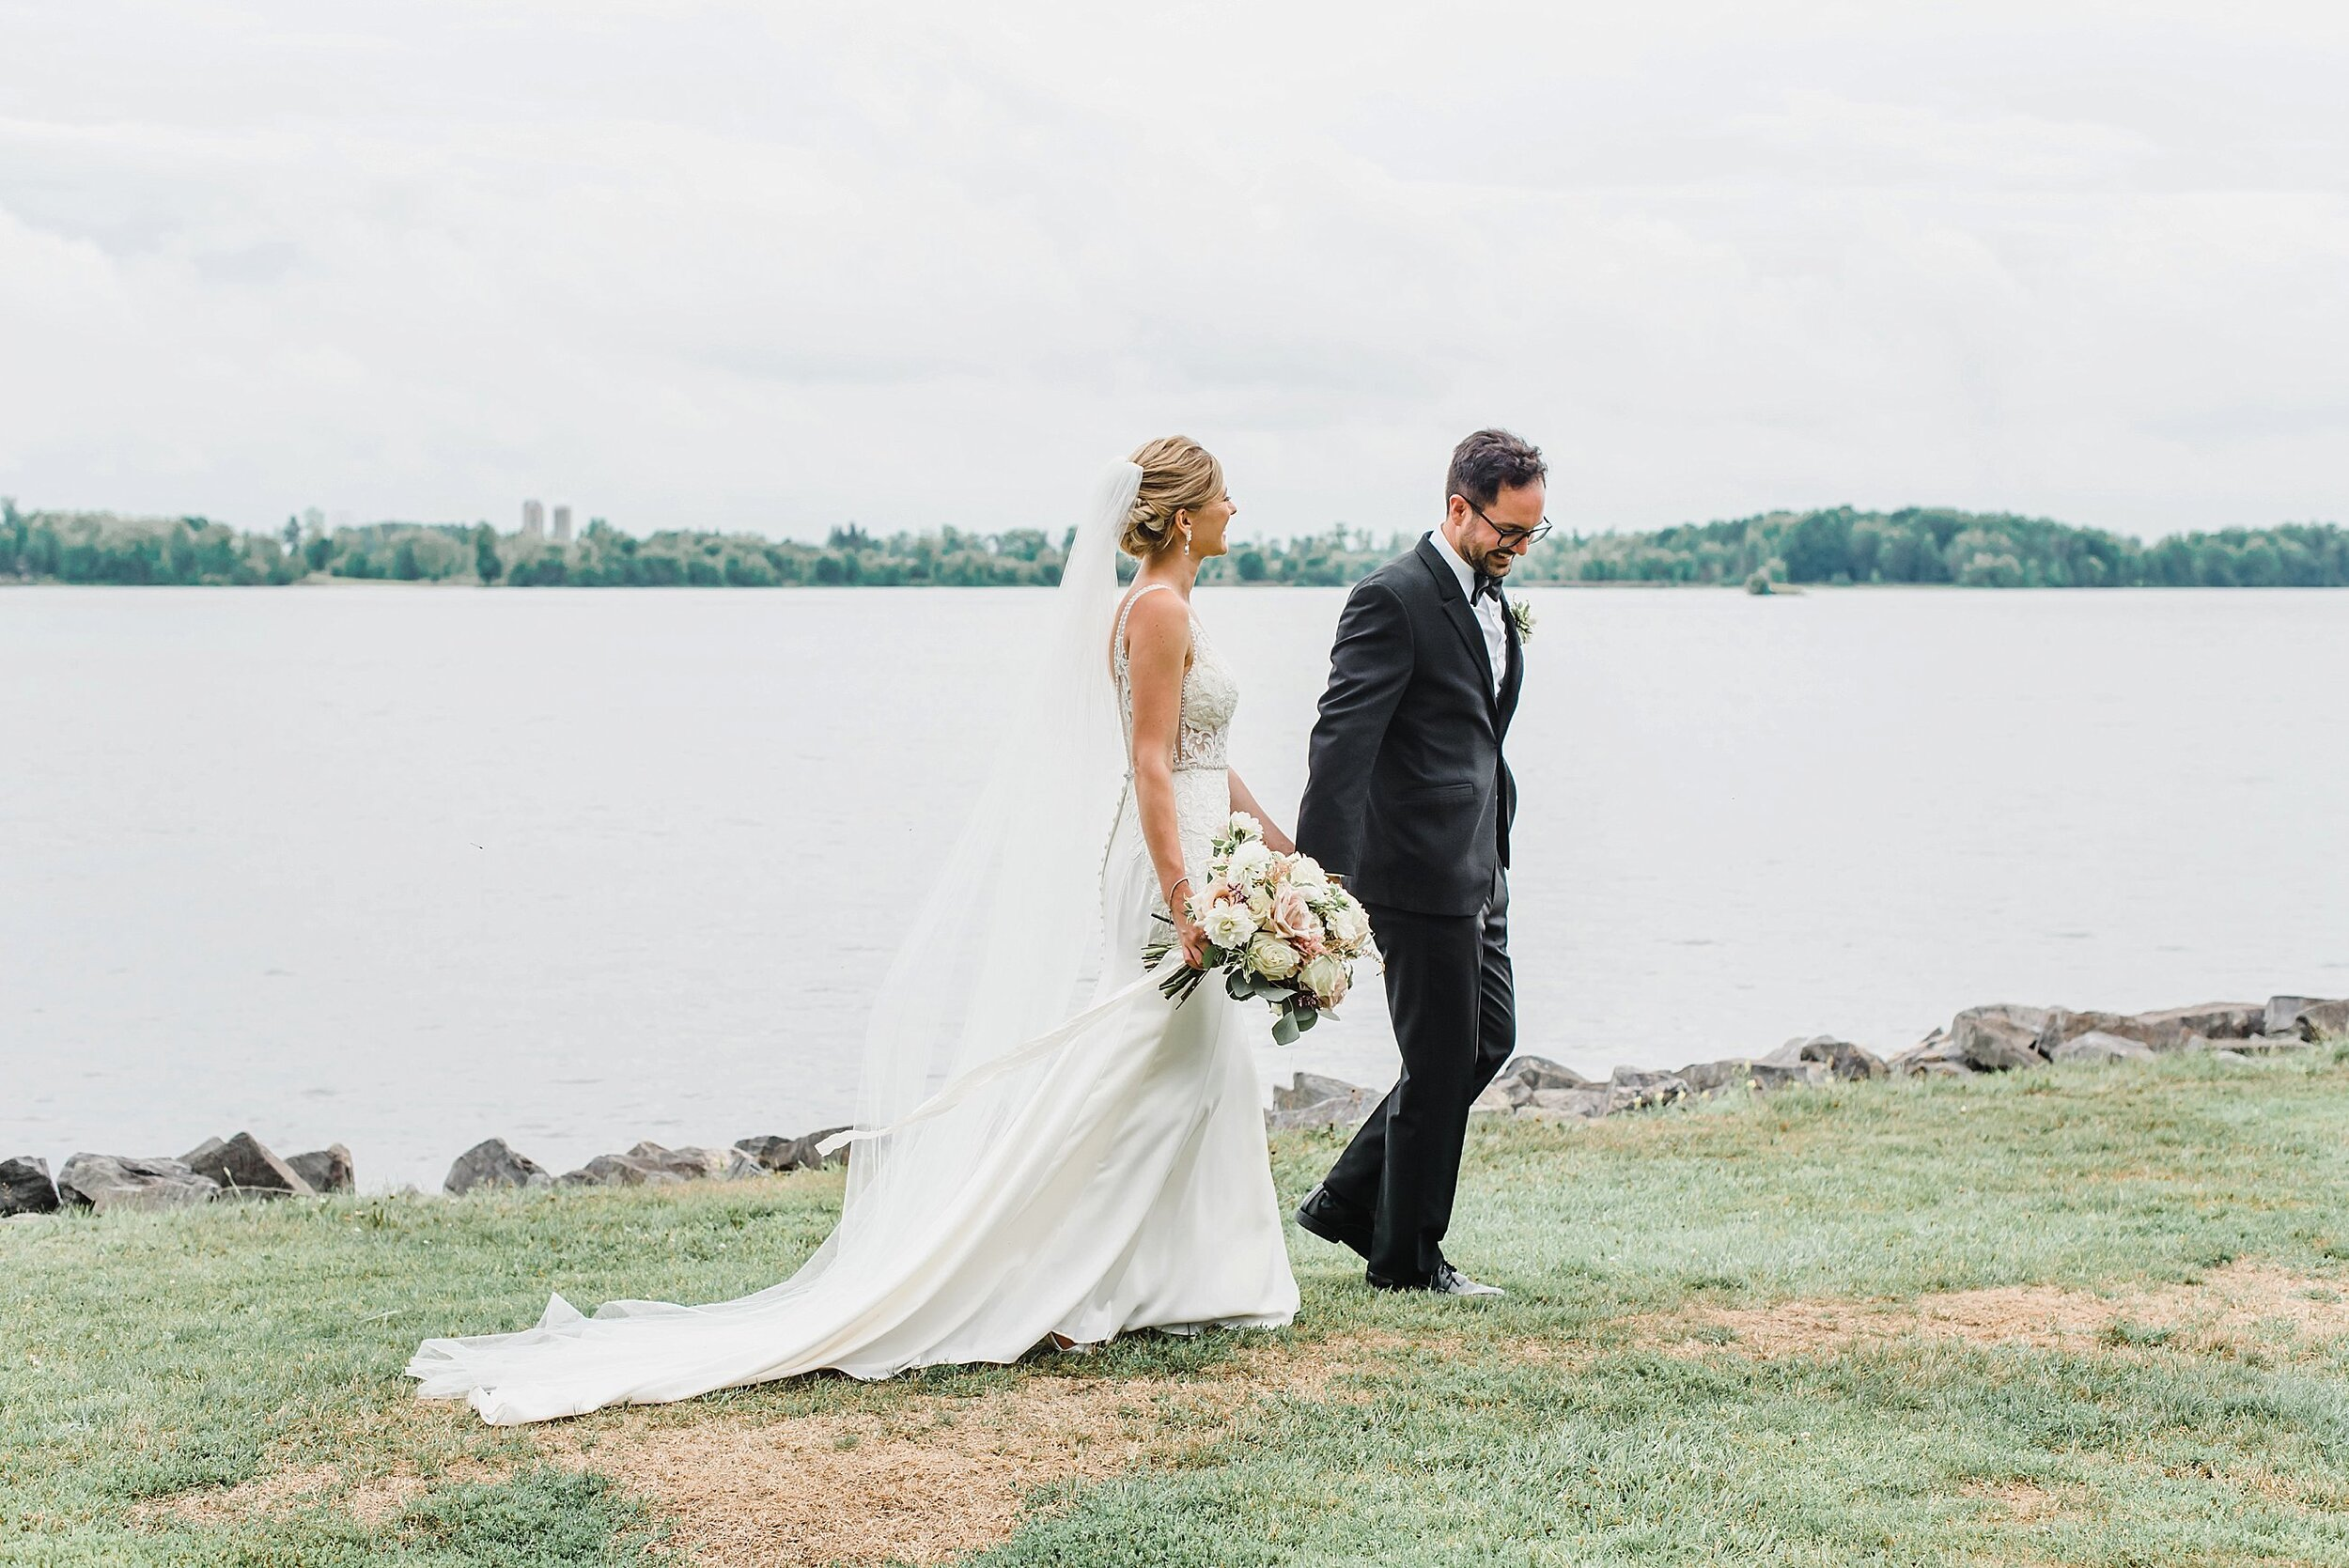 light airy fine art ottawa wedding photographer | Ali and Batoul Photography | Fairmont Le Chateau Montebello51.jpg